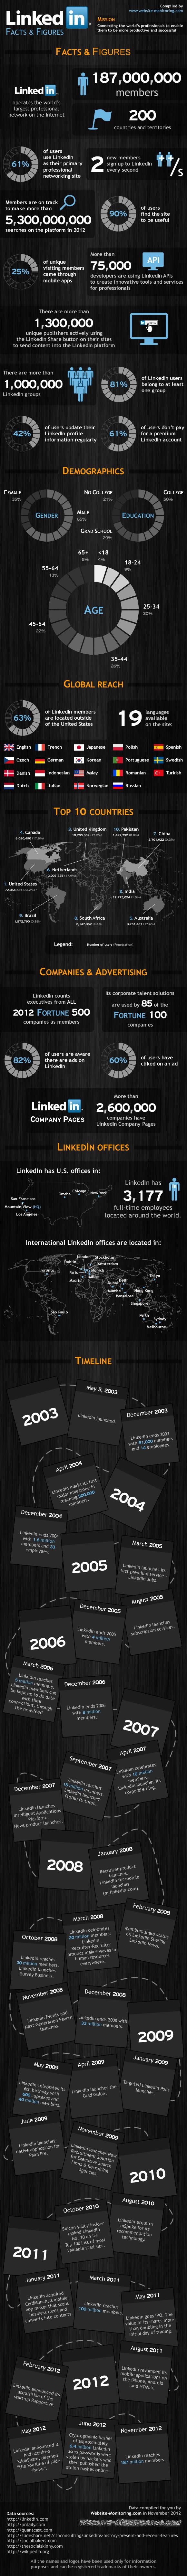 Todo lo que debes saber sobre Linkedin